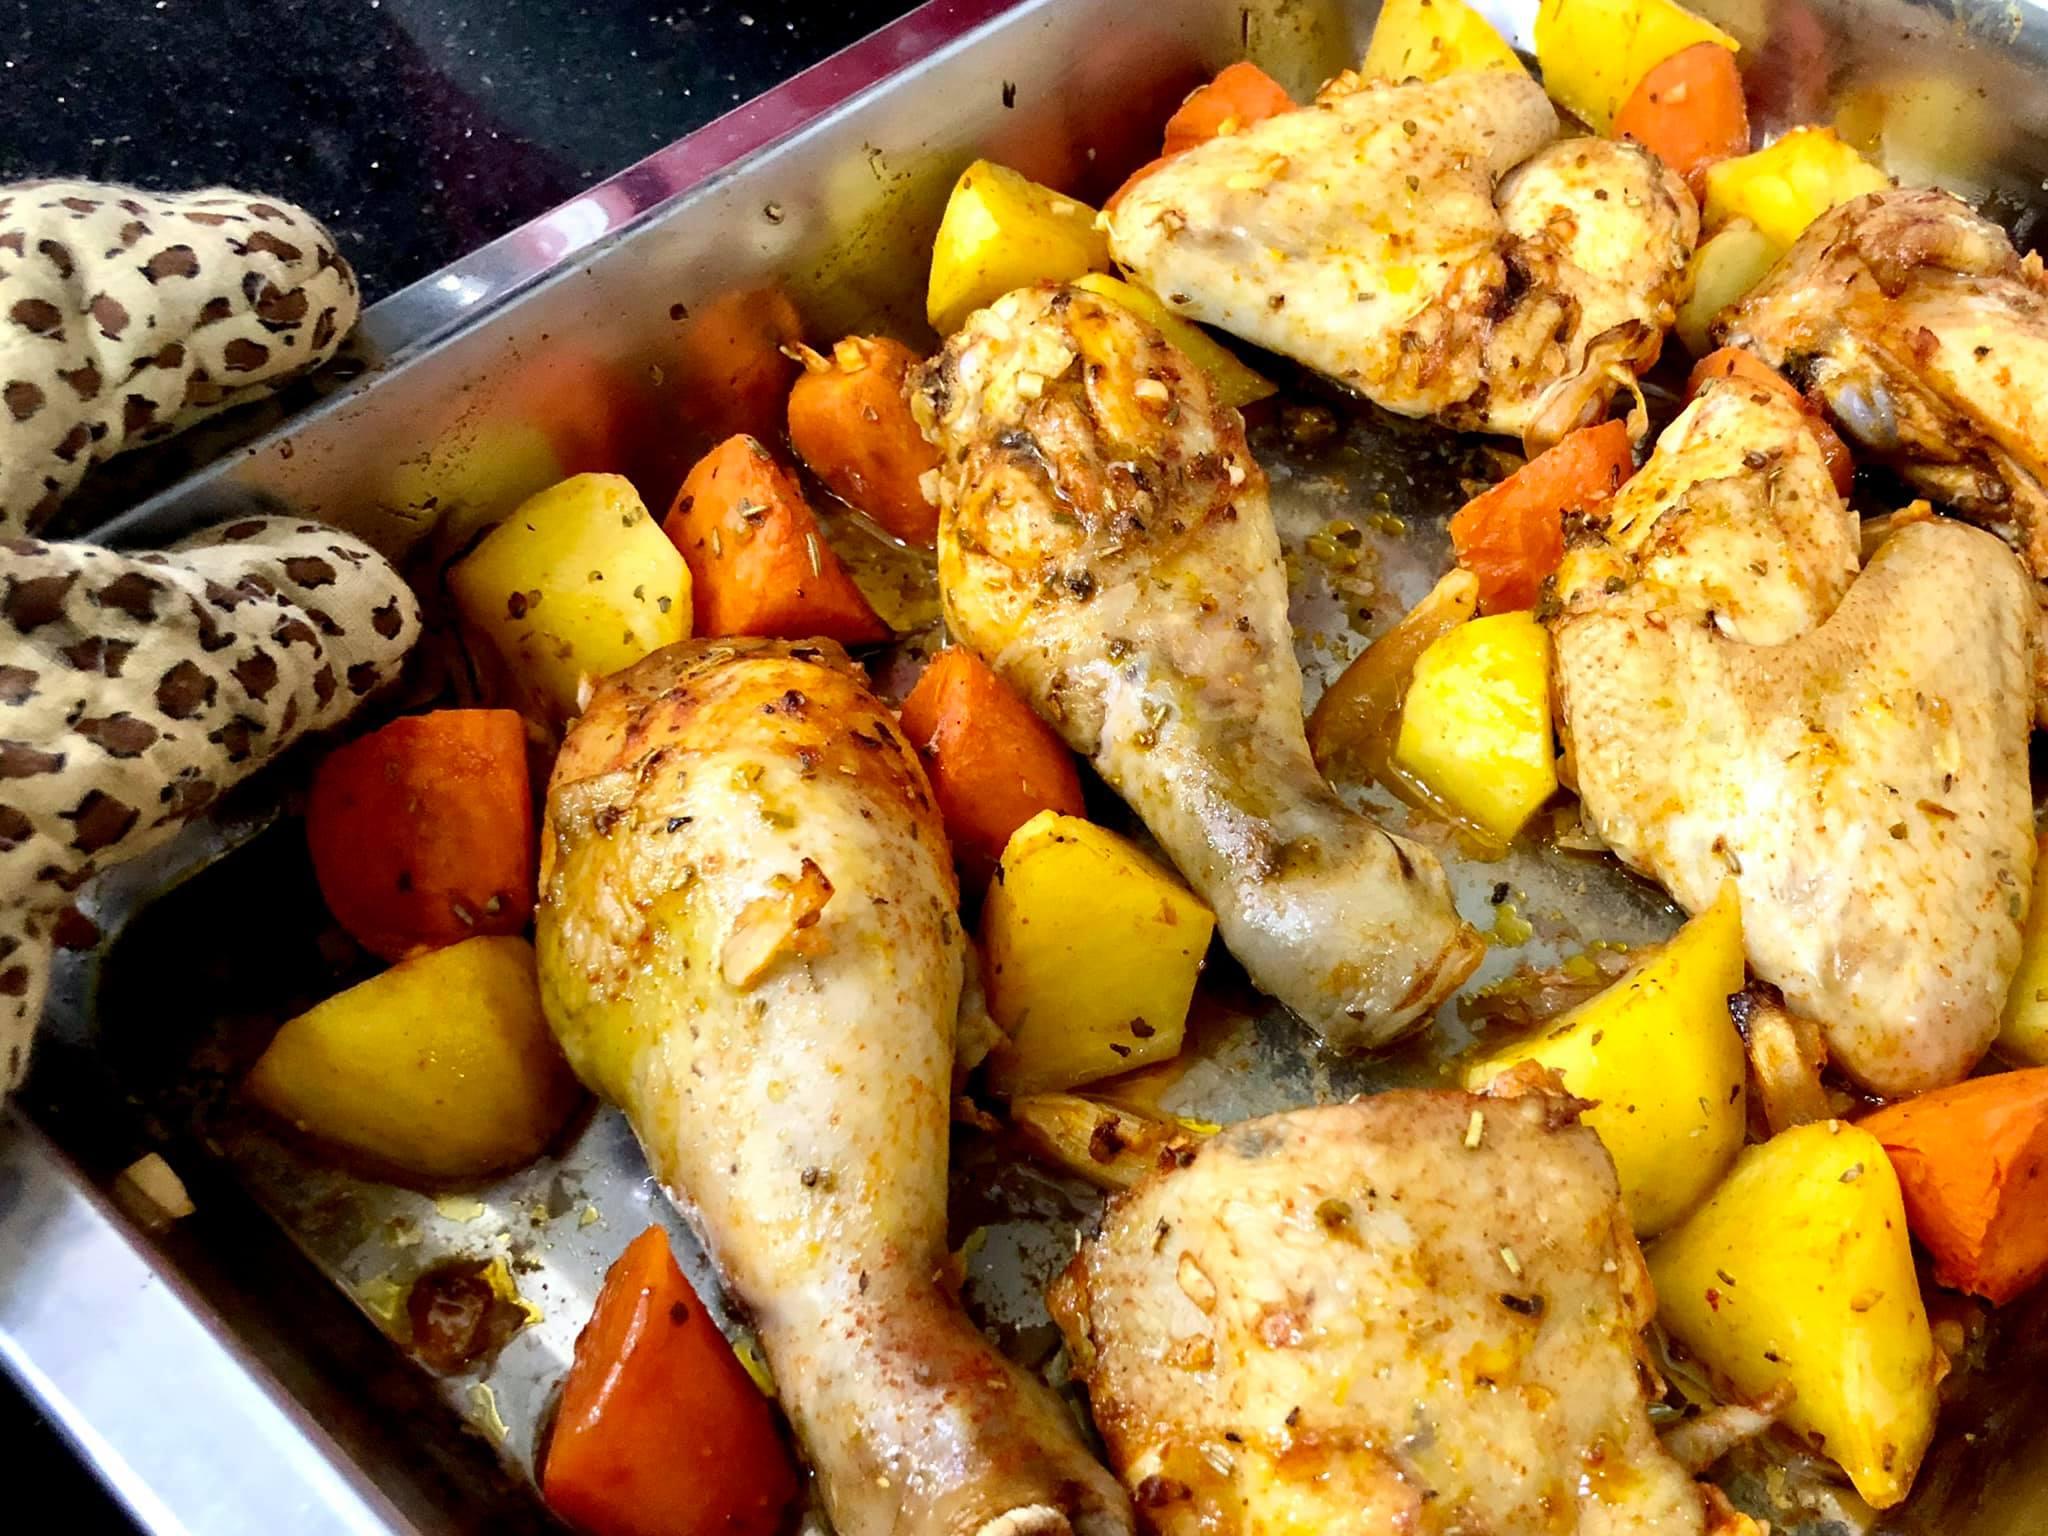 Masak Menu Juicy Chicken Roasted Untuk Anak Sulung Aku